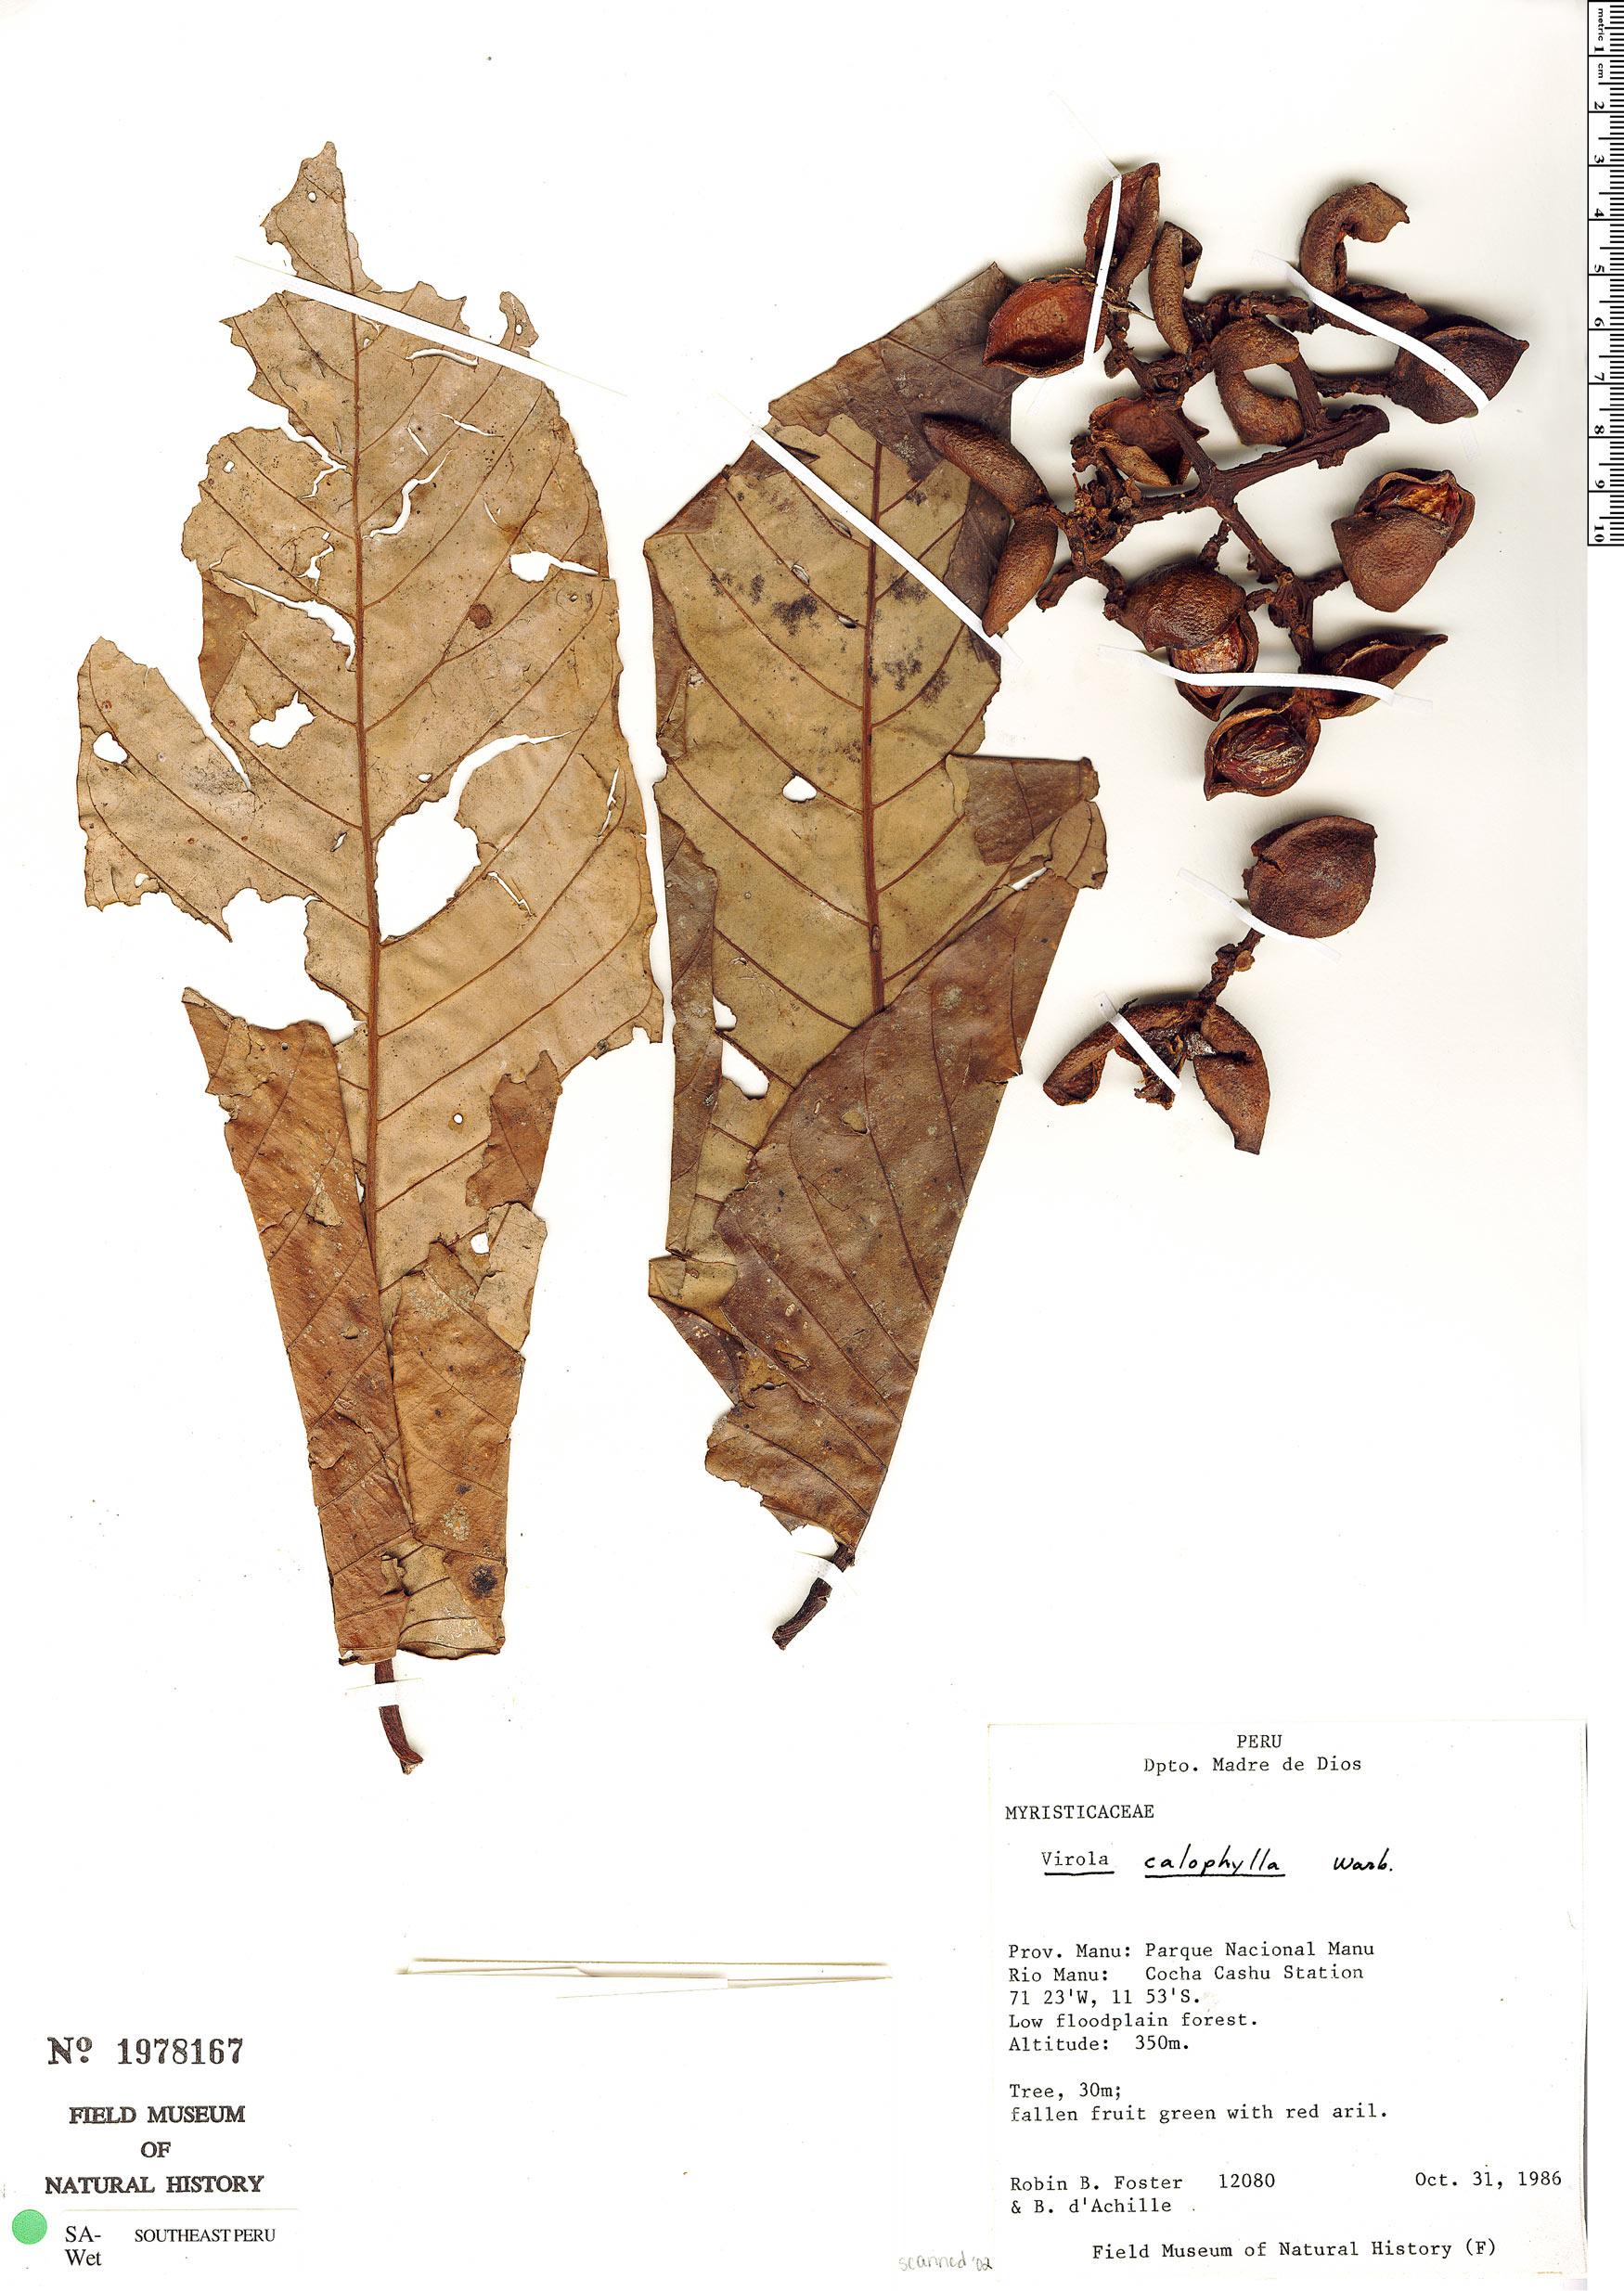 Specimen: Virola calophylla